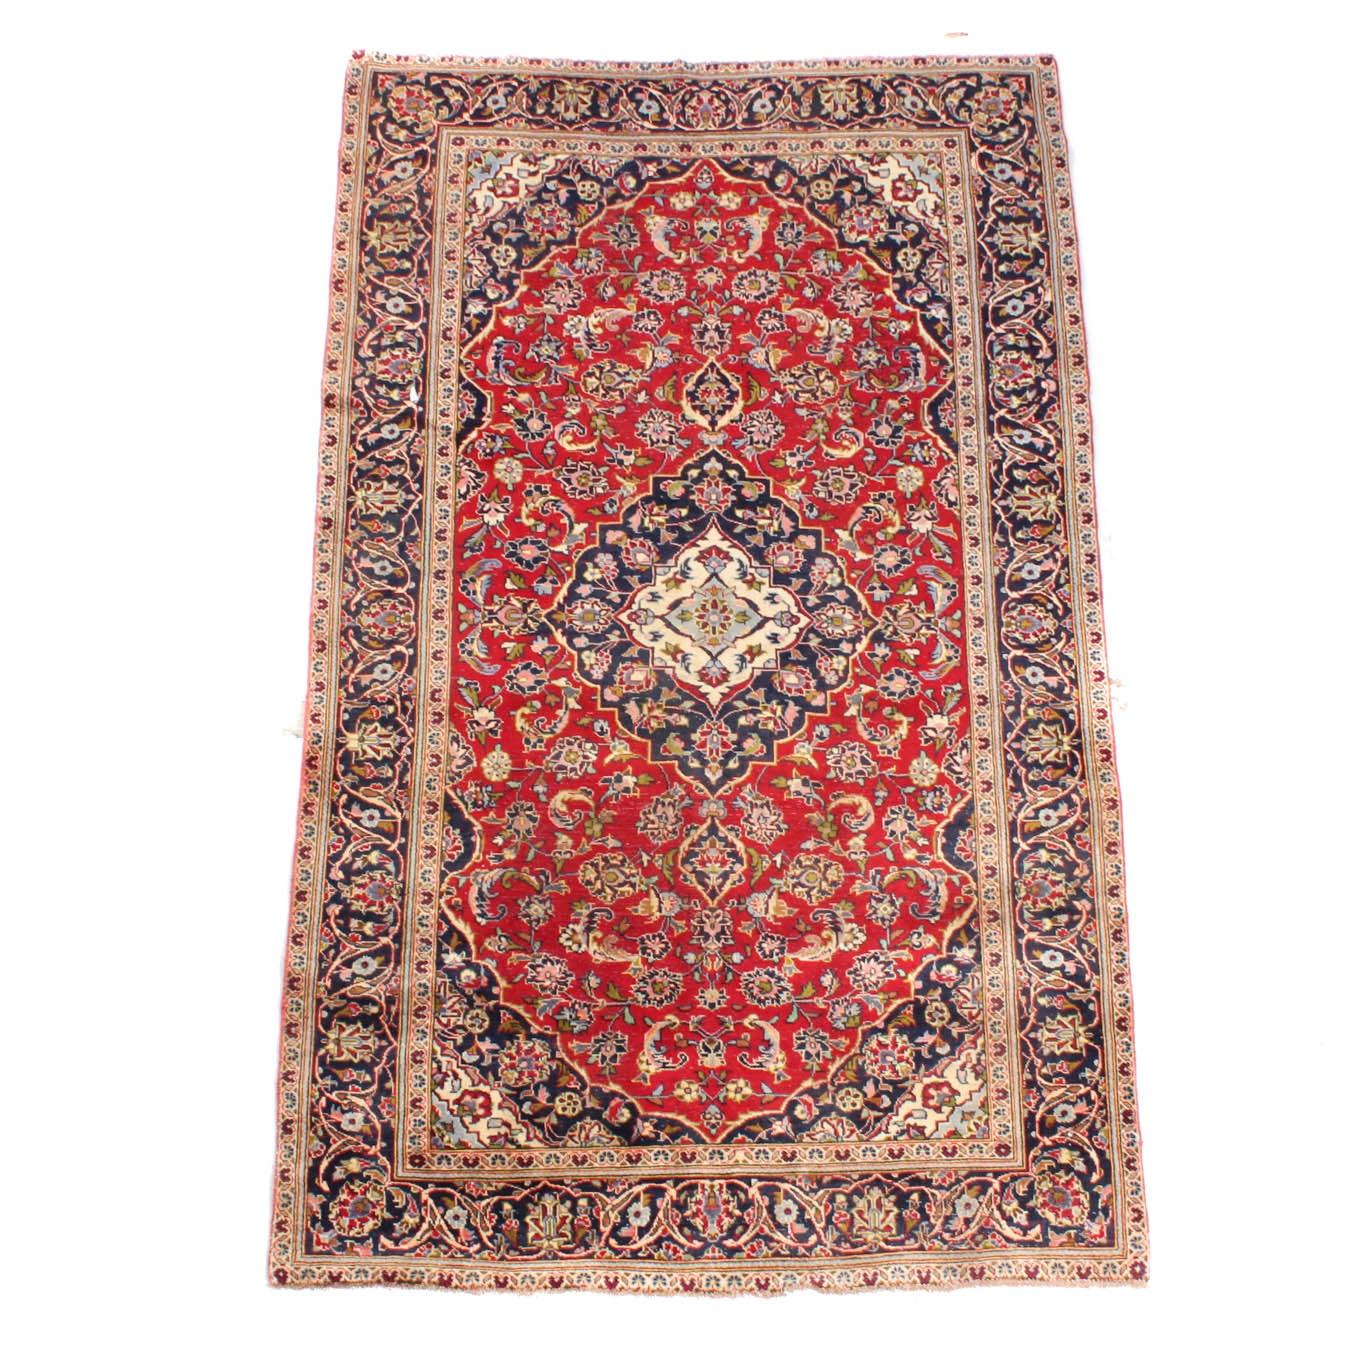 Vintage Hand-Knotted Persian Ardekan Kashan Rug